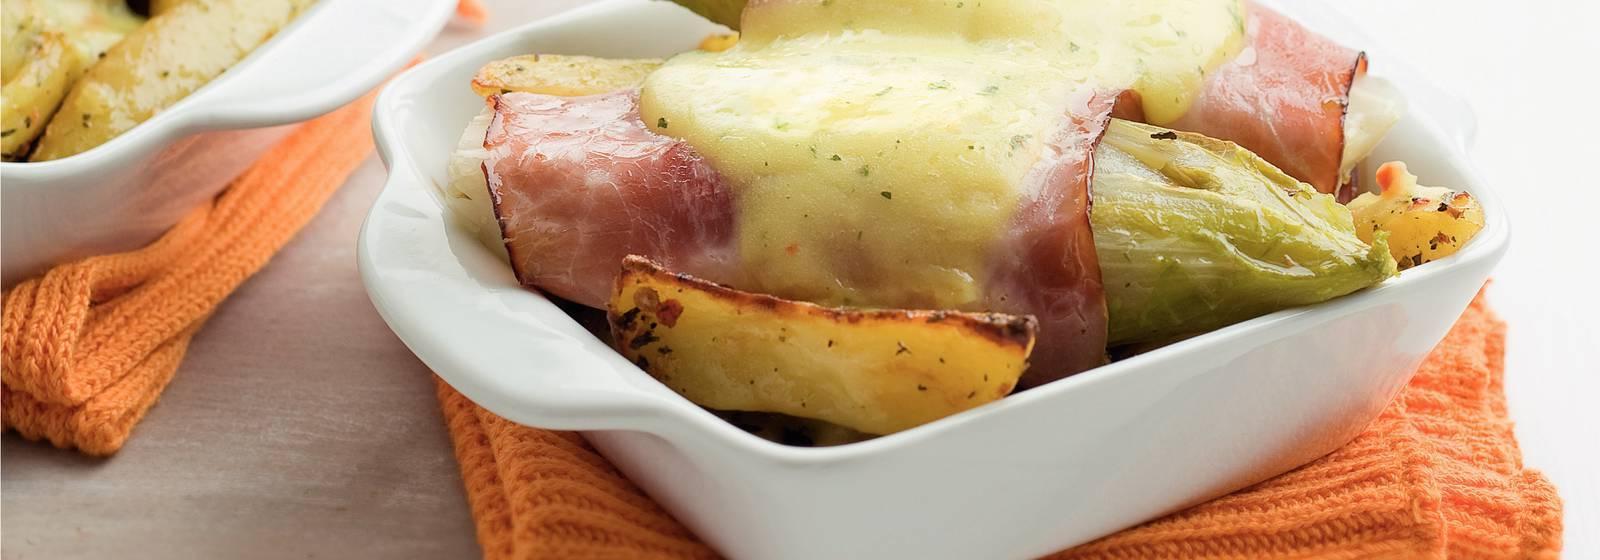 Chicory dish with cheese sauce